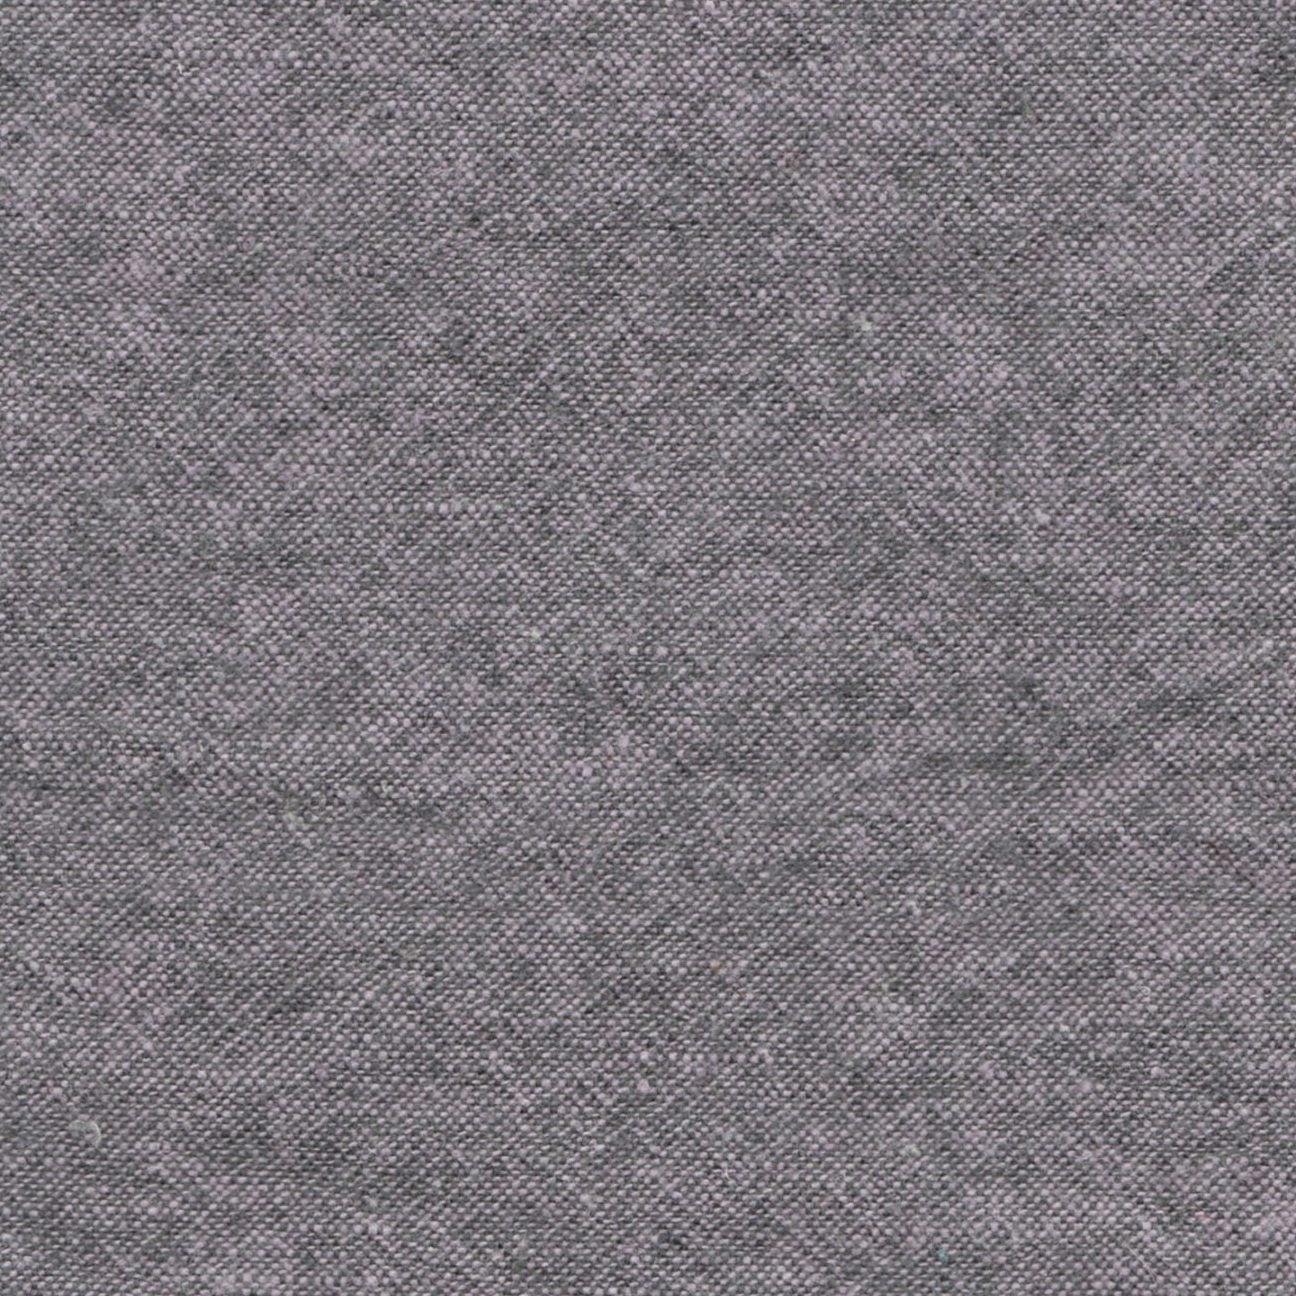 Linen-Union-in-Emile-Graphite-fabric-by-Annie-Sloan-2000-1800×1441